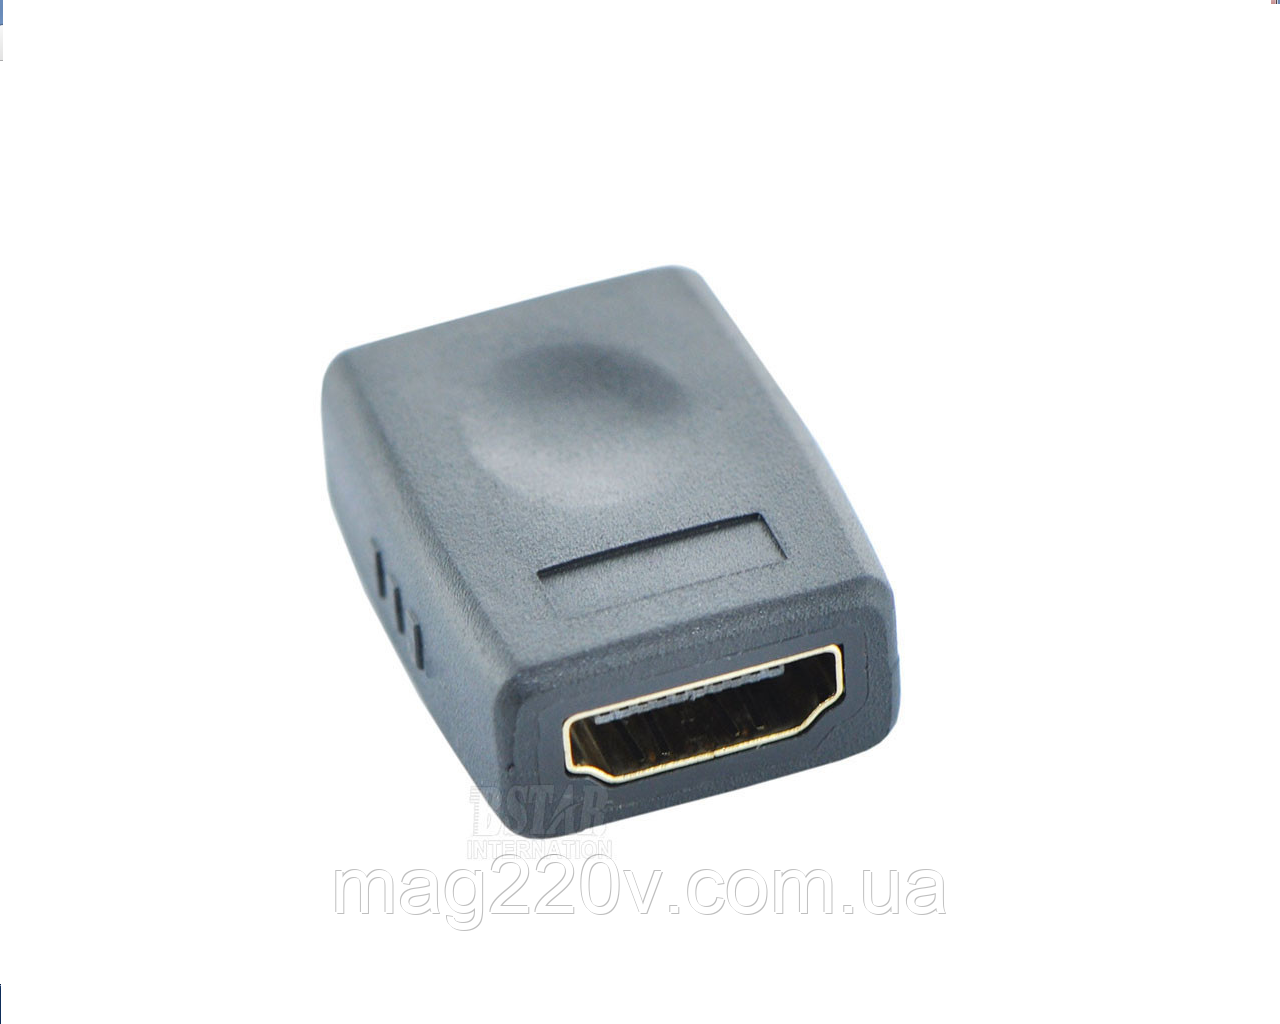 Соединитель HDMI(A) - HDMI(A)